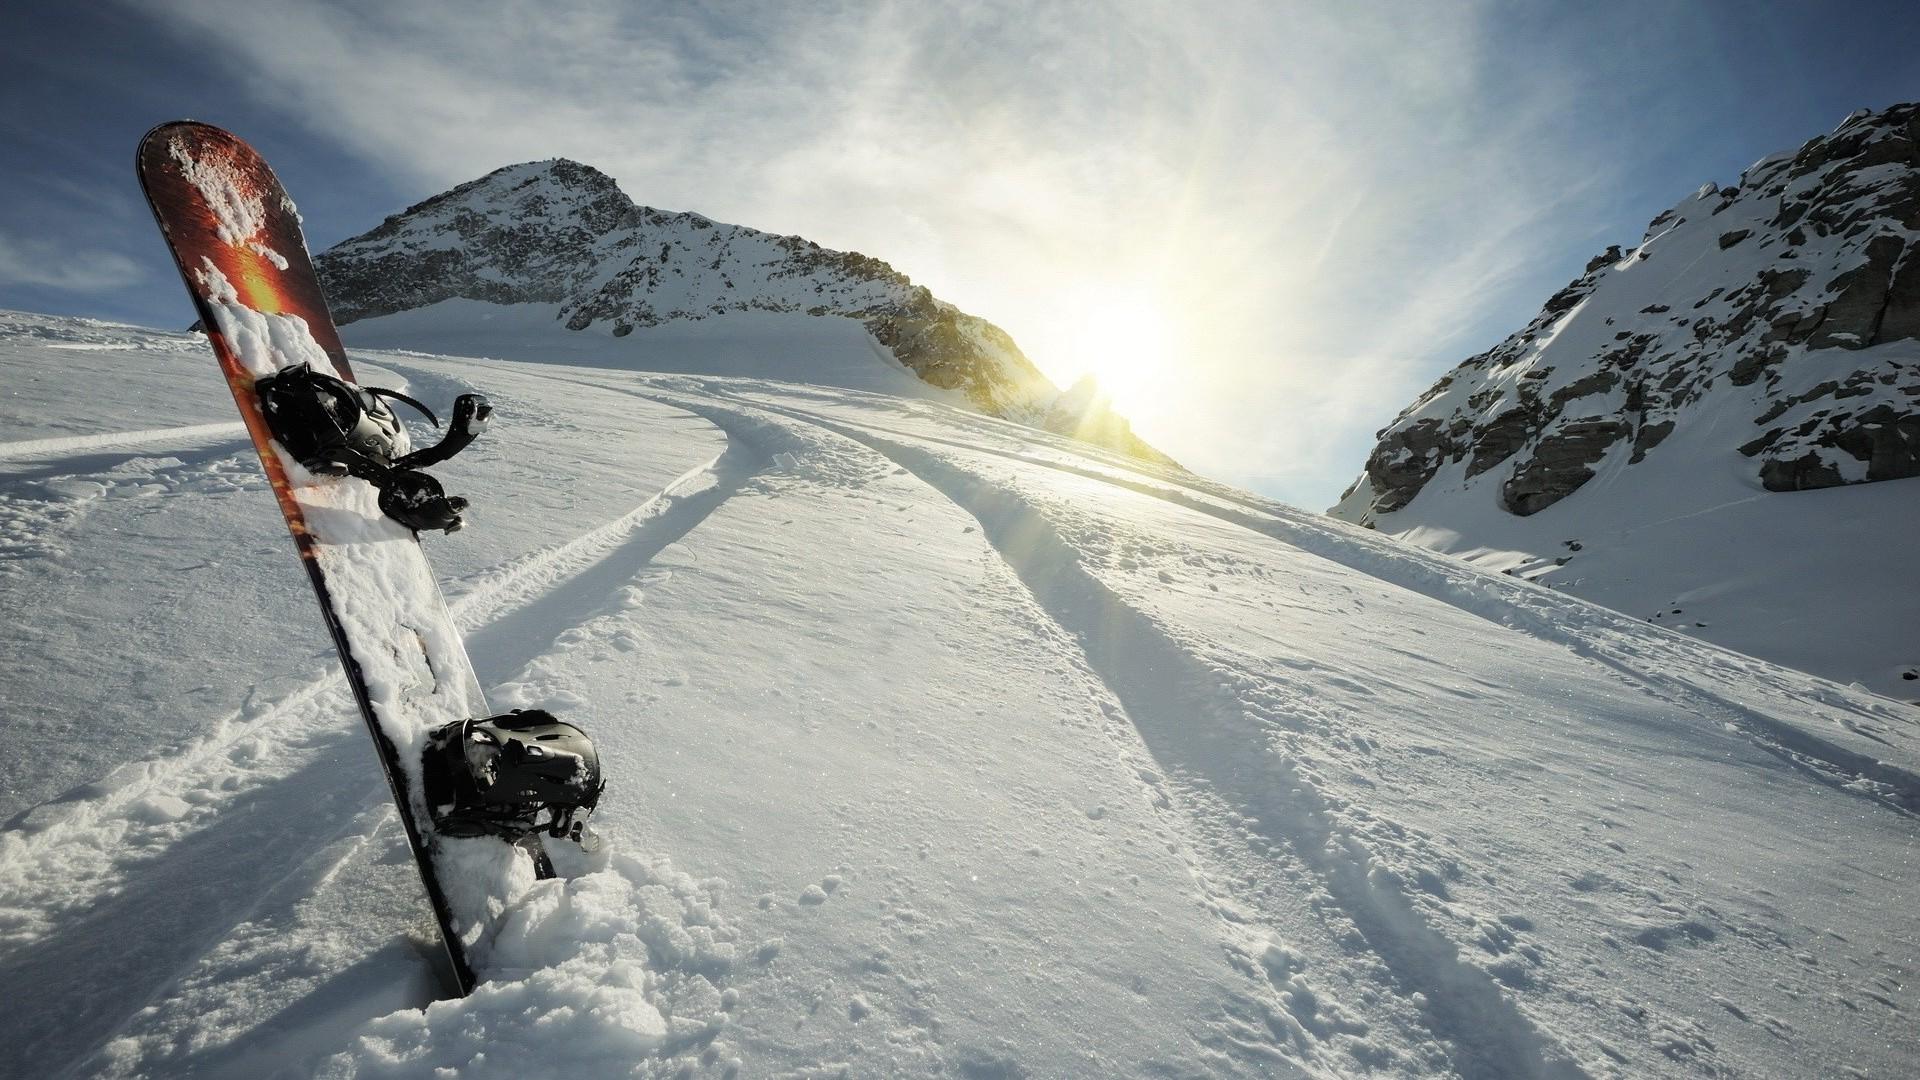 Free Download Snowboard Wallpaper Hd 882 1920x1080 Umadcom 1920x1080 For Your Desktop Mobile Tablet Explore 73 Snowboarding Wallpaper Hd Burton Snowboard Wallpaper Snowboarding Wallpapers For Desktop